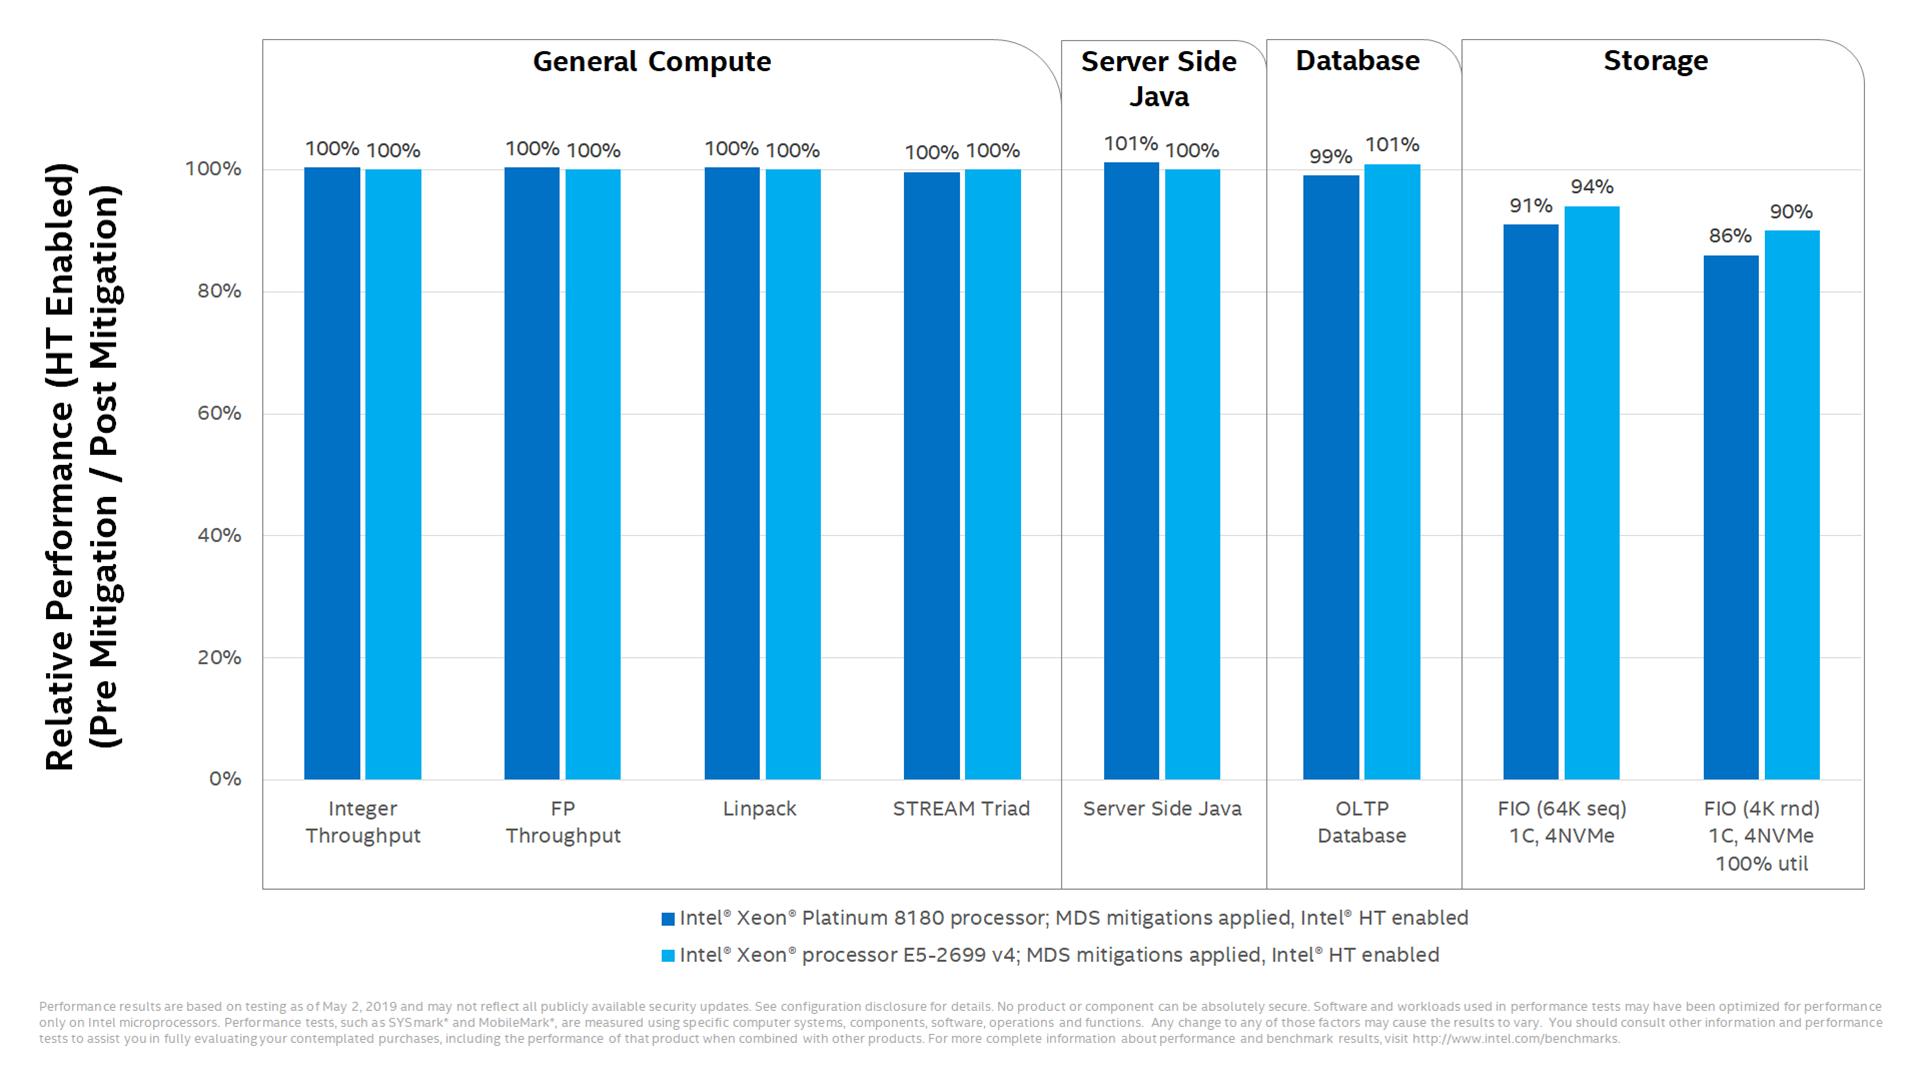 Intel's data on post-fix server performance